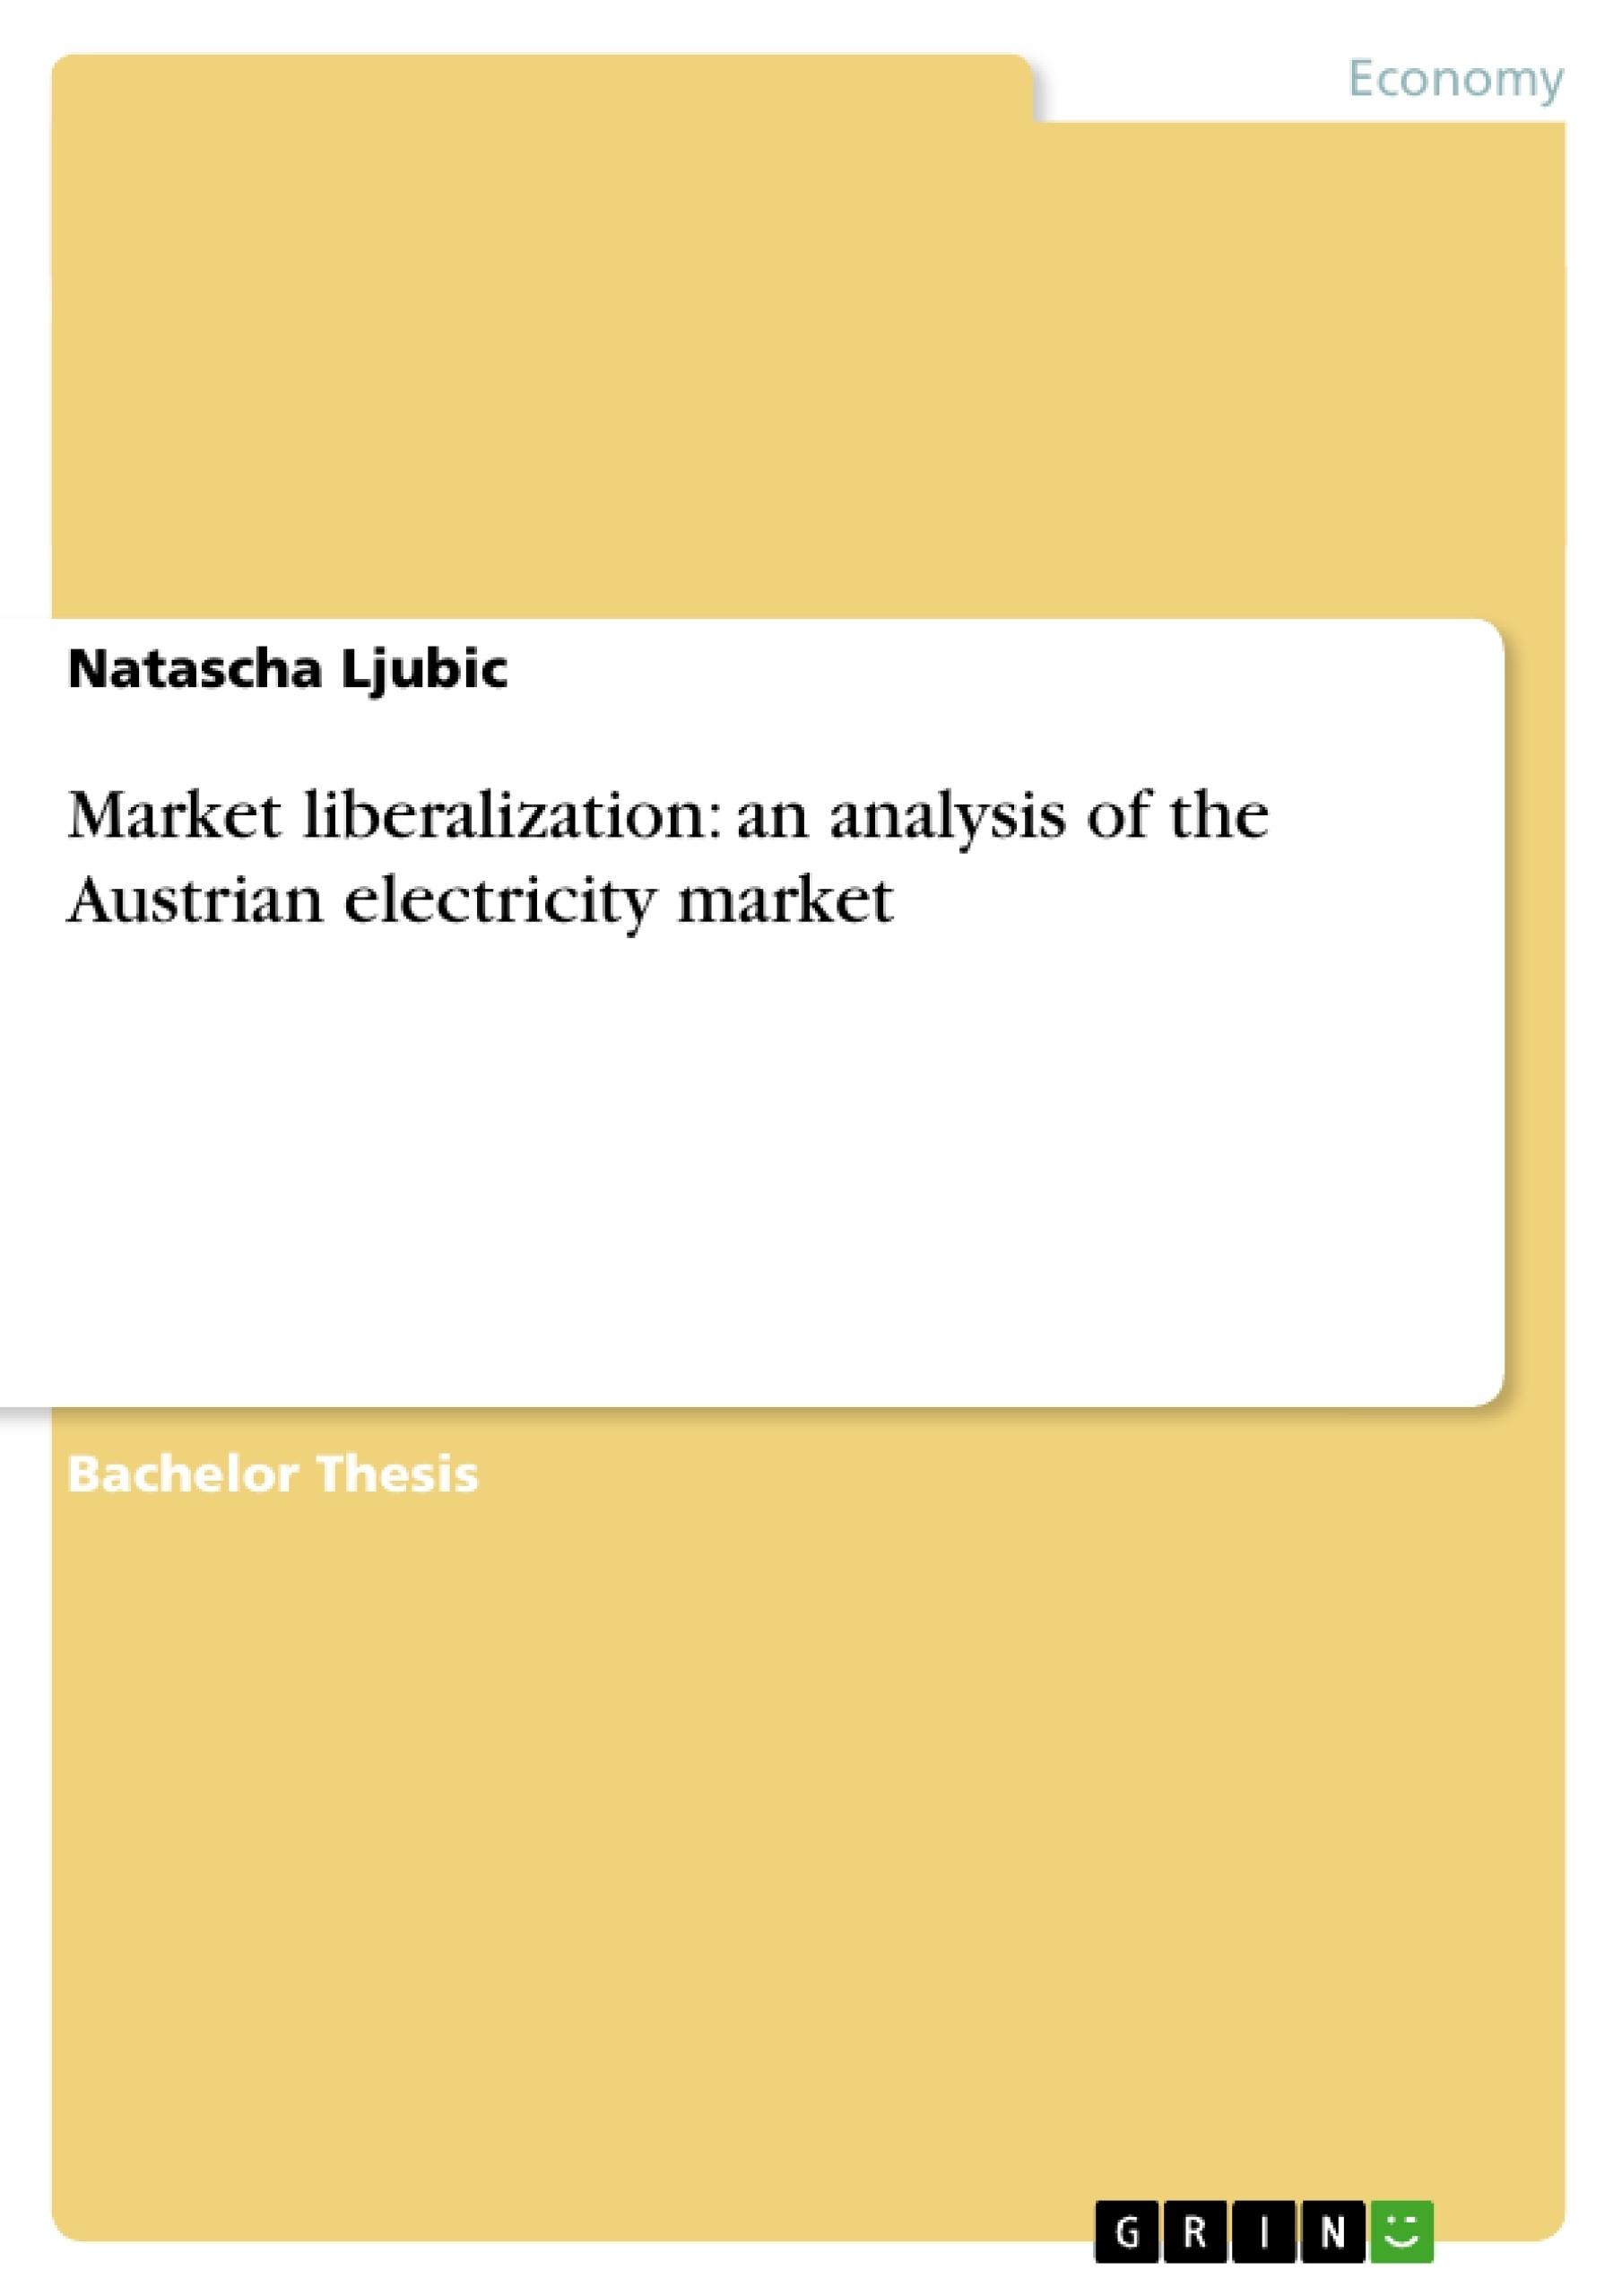 Title: Market liberalization: an analysis of the Austrian electricity market